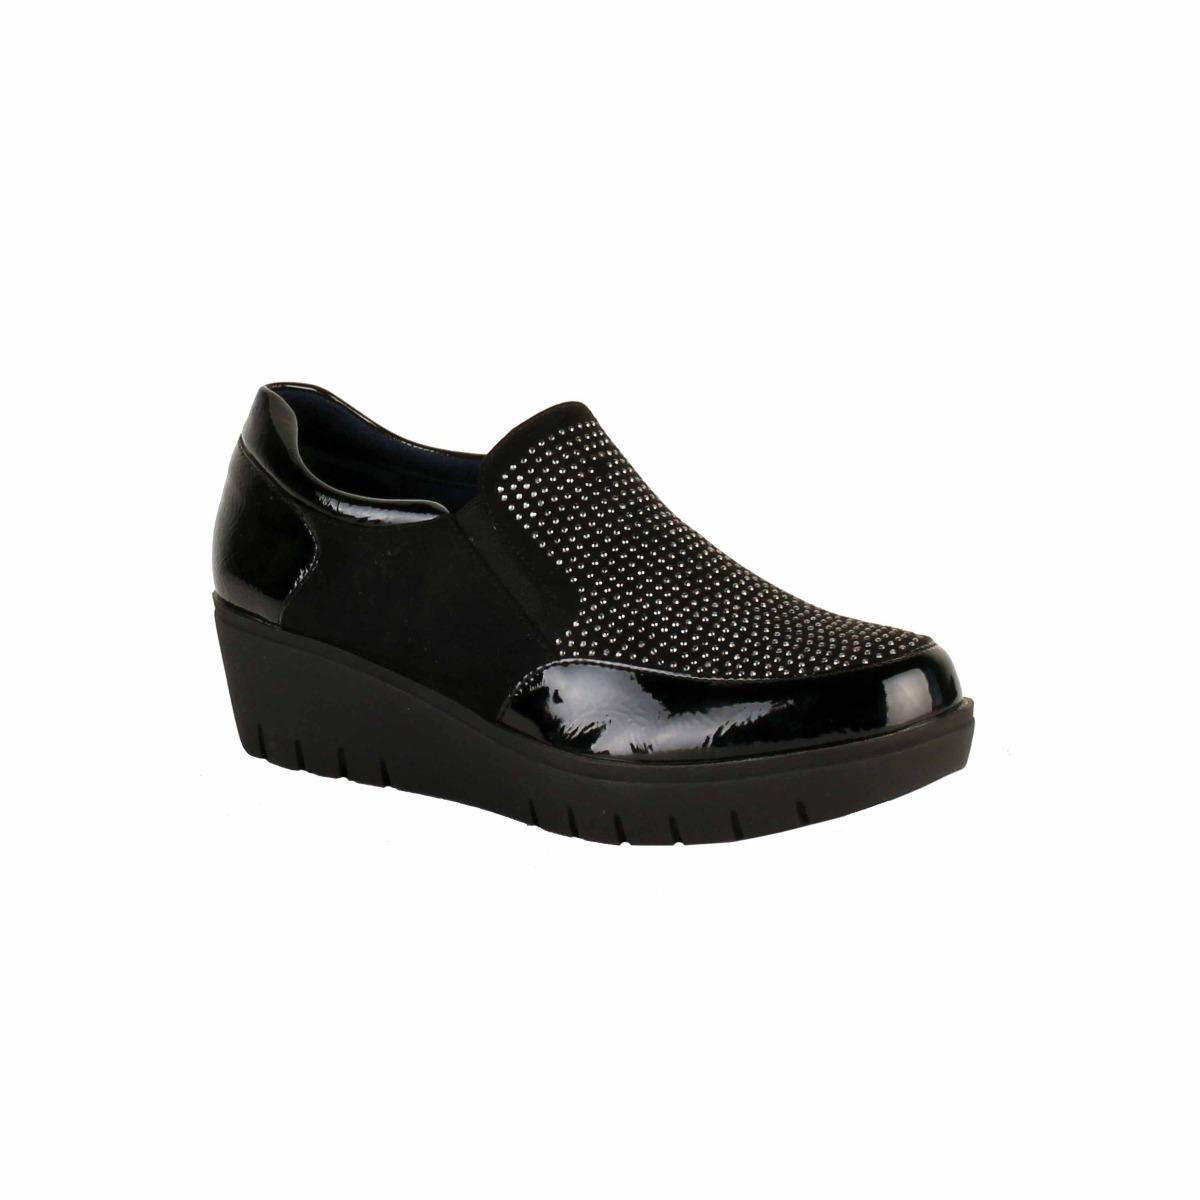 brillantes sormani zapatos charol negro zoom Cargando 8ZaAwHEq